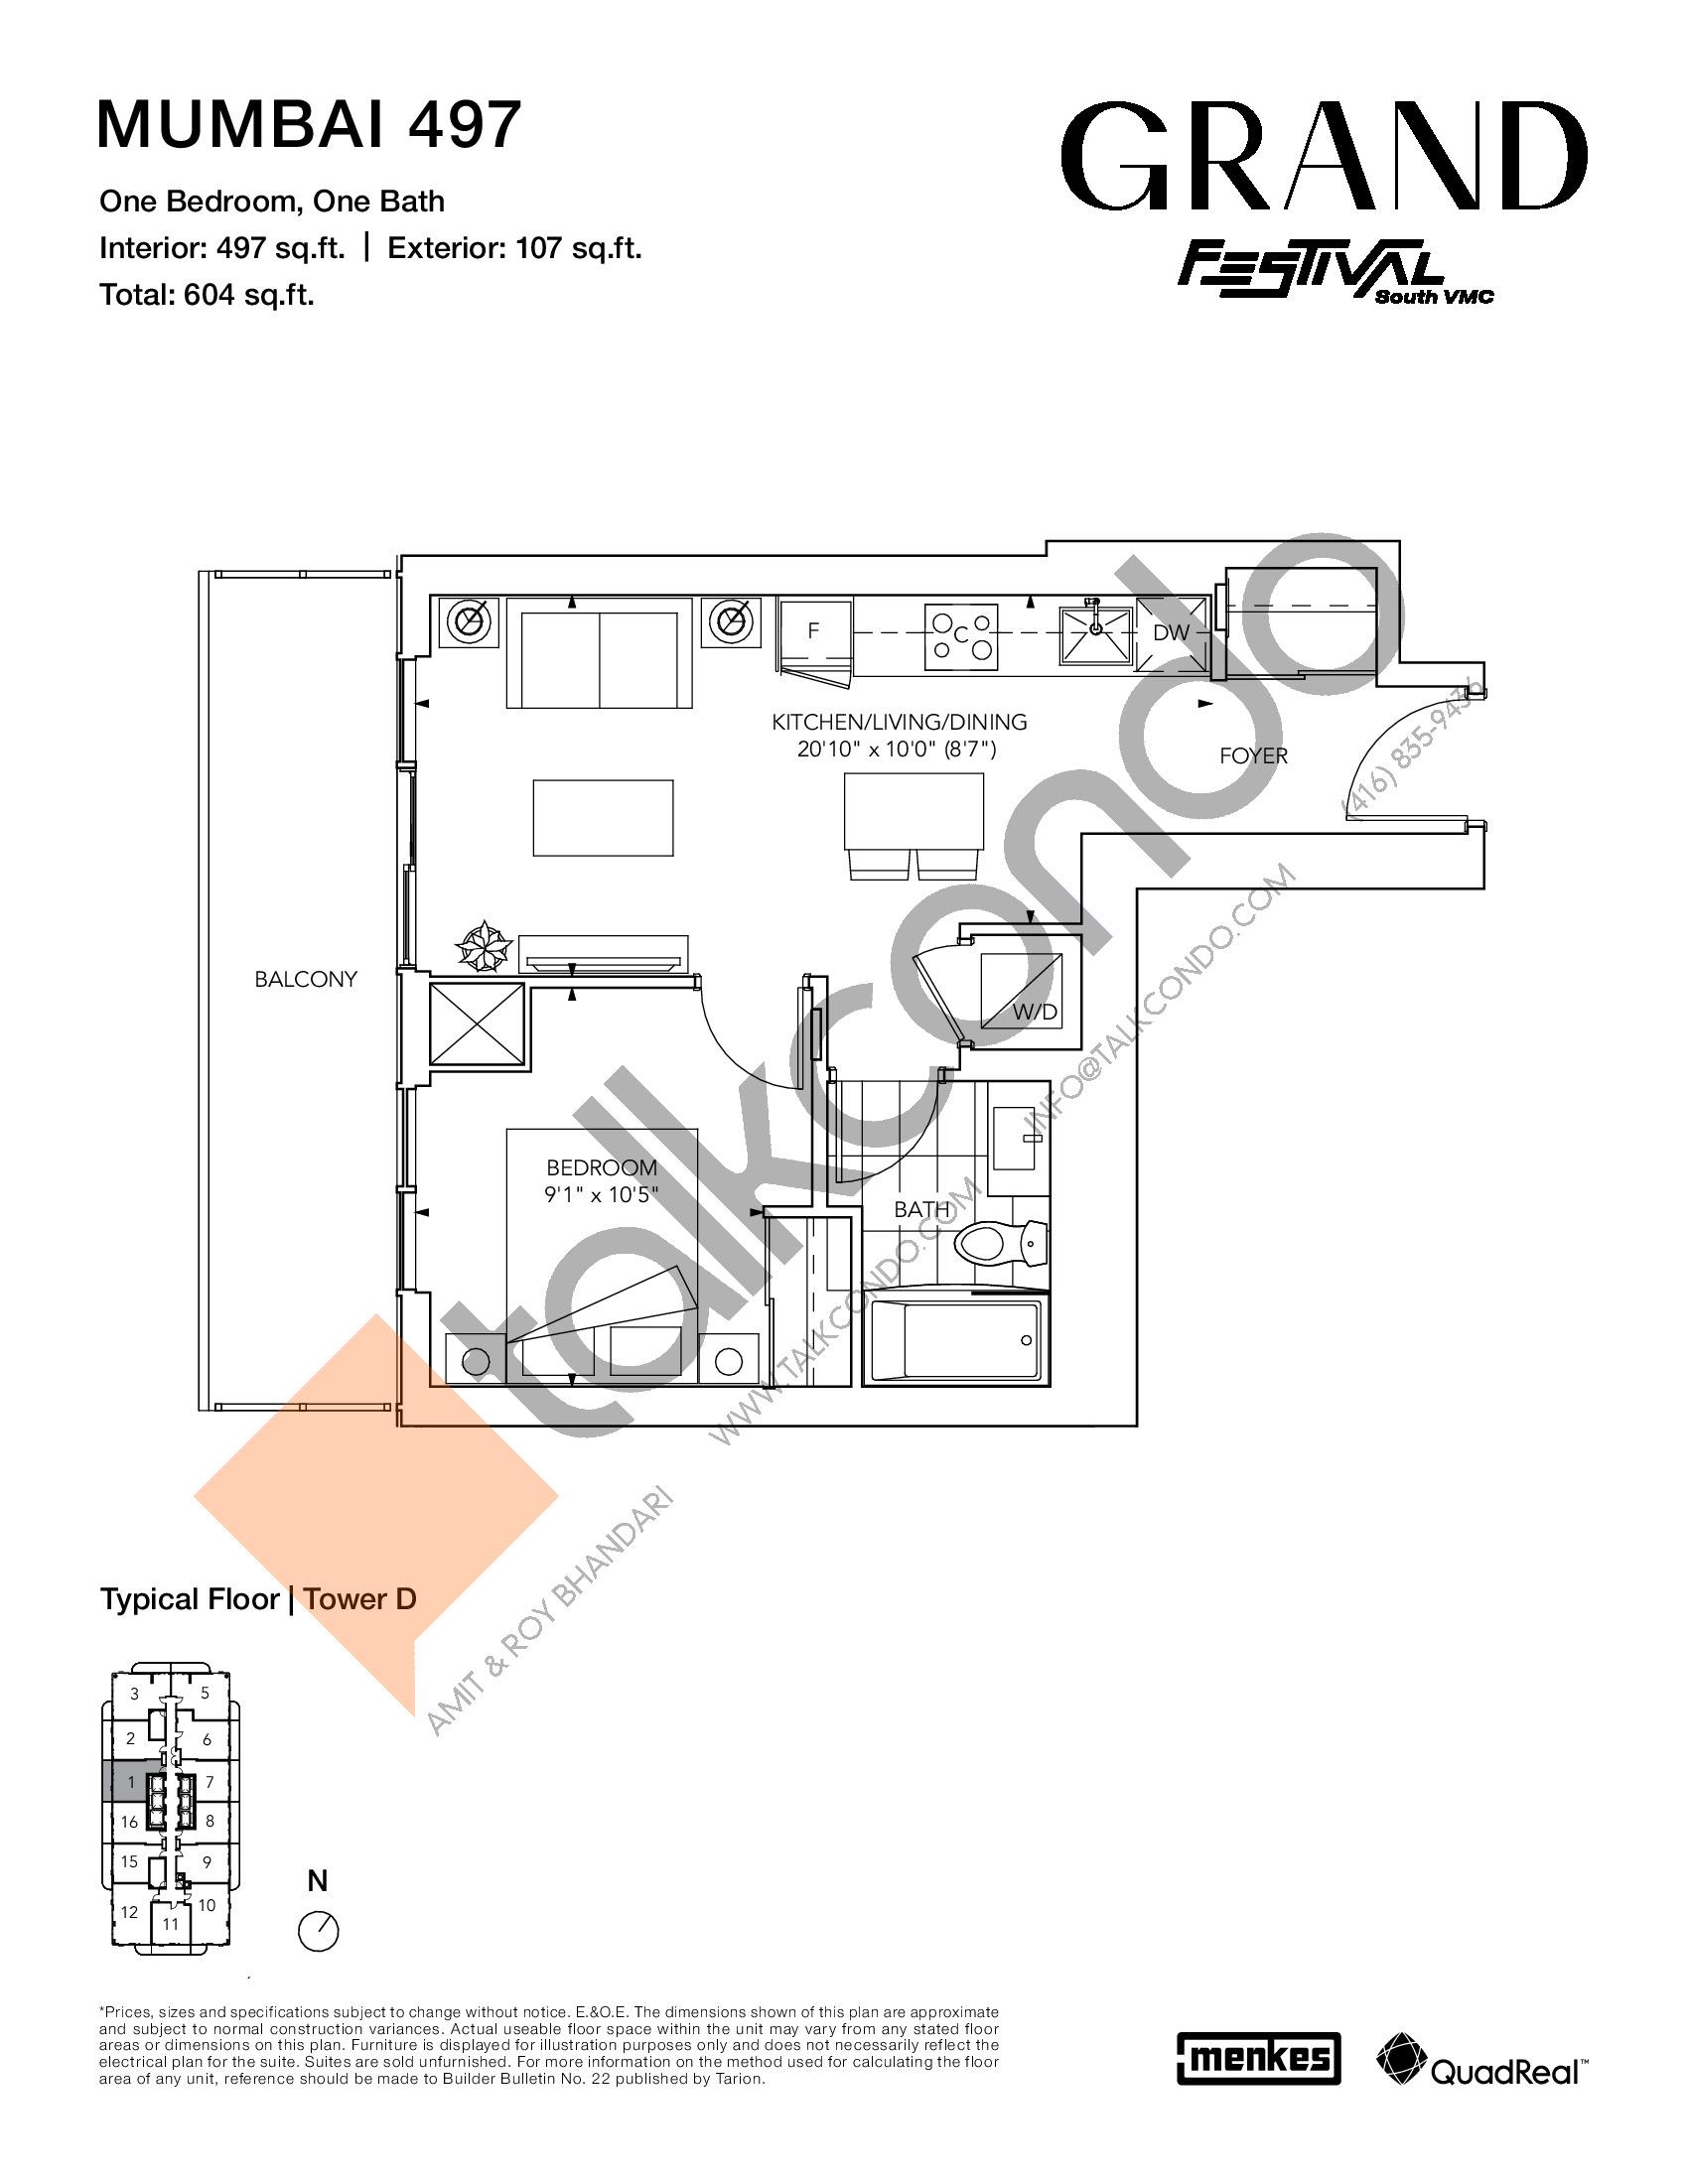 Mumbai 497 Floor Plan at Grand Festival Condos - 497 sq.ft